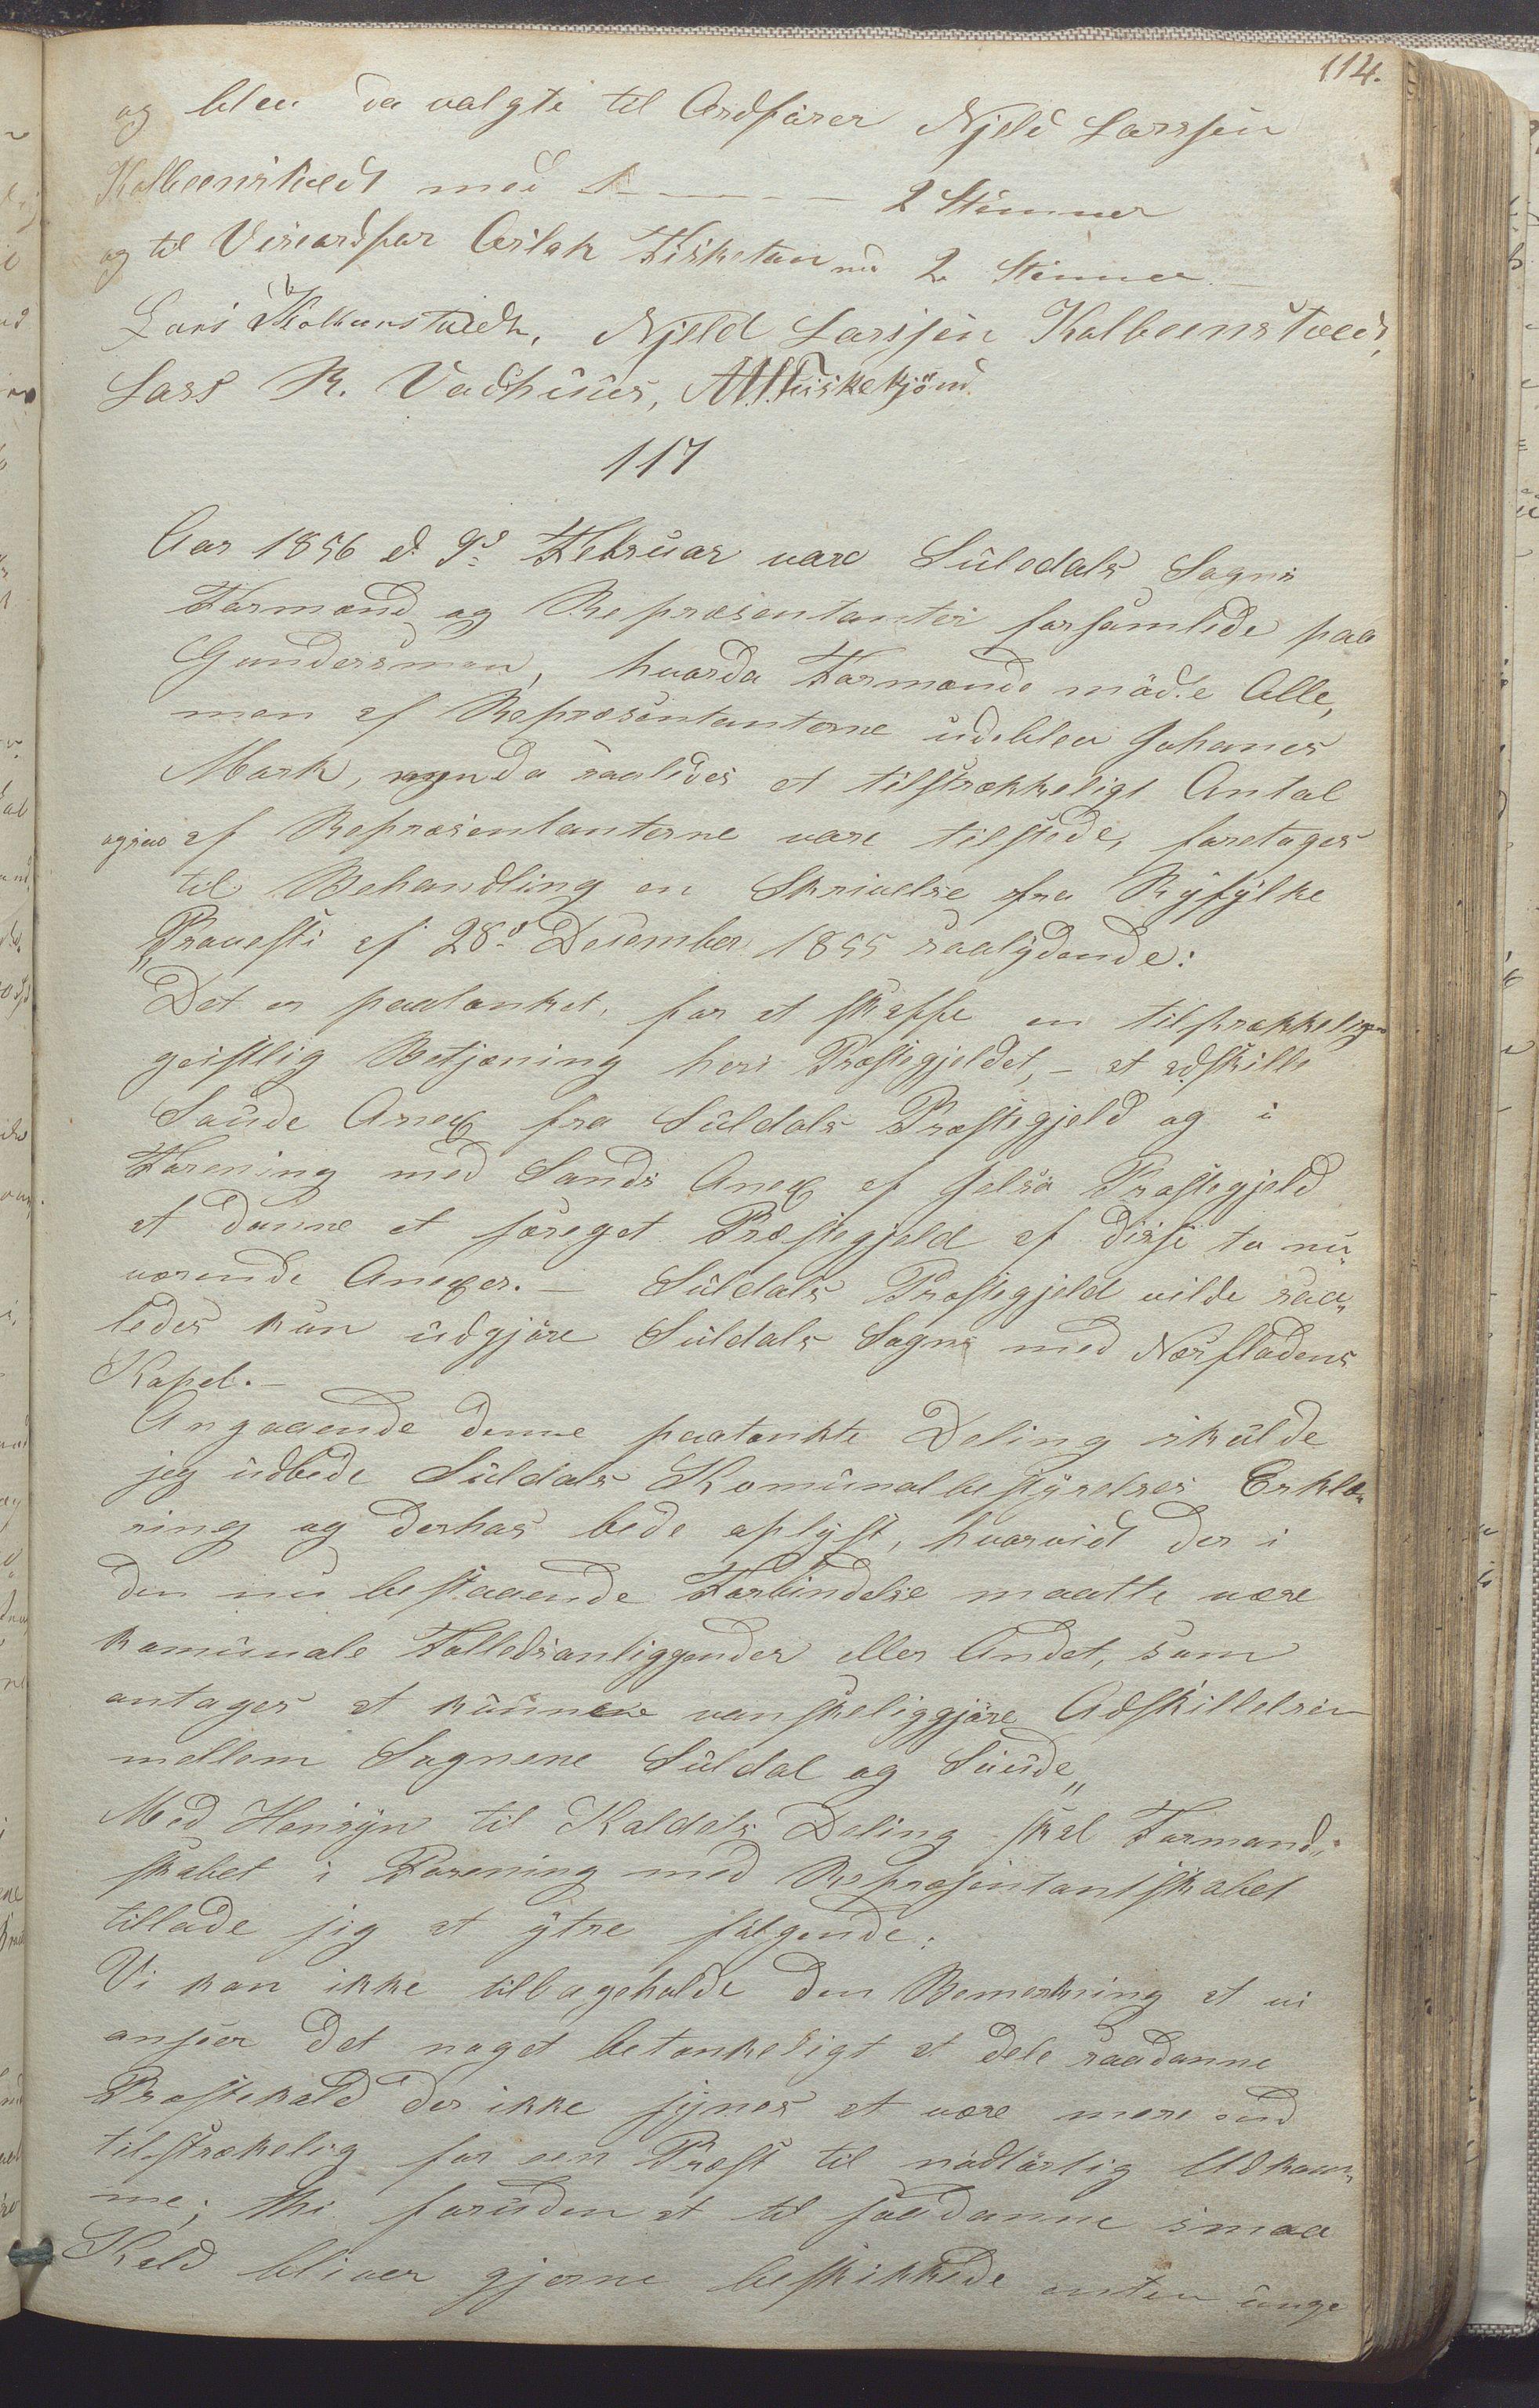 IKAR, Suldal kommune - Formannskapet/Rådmannen, A/Aa/L0001: Møtebok, 1837-1876, s. 114a